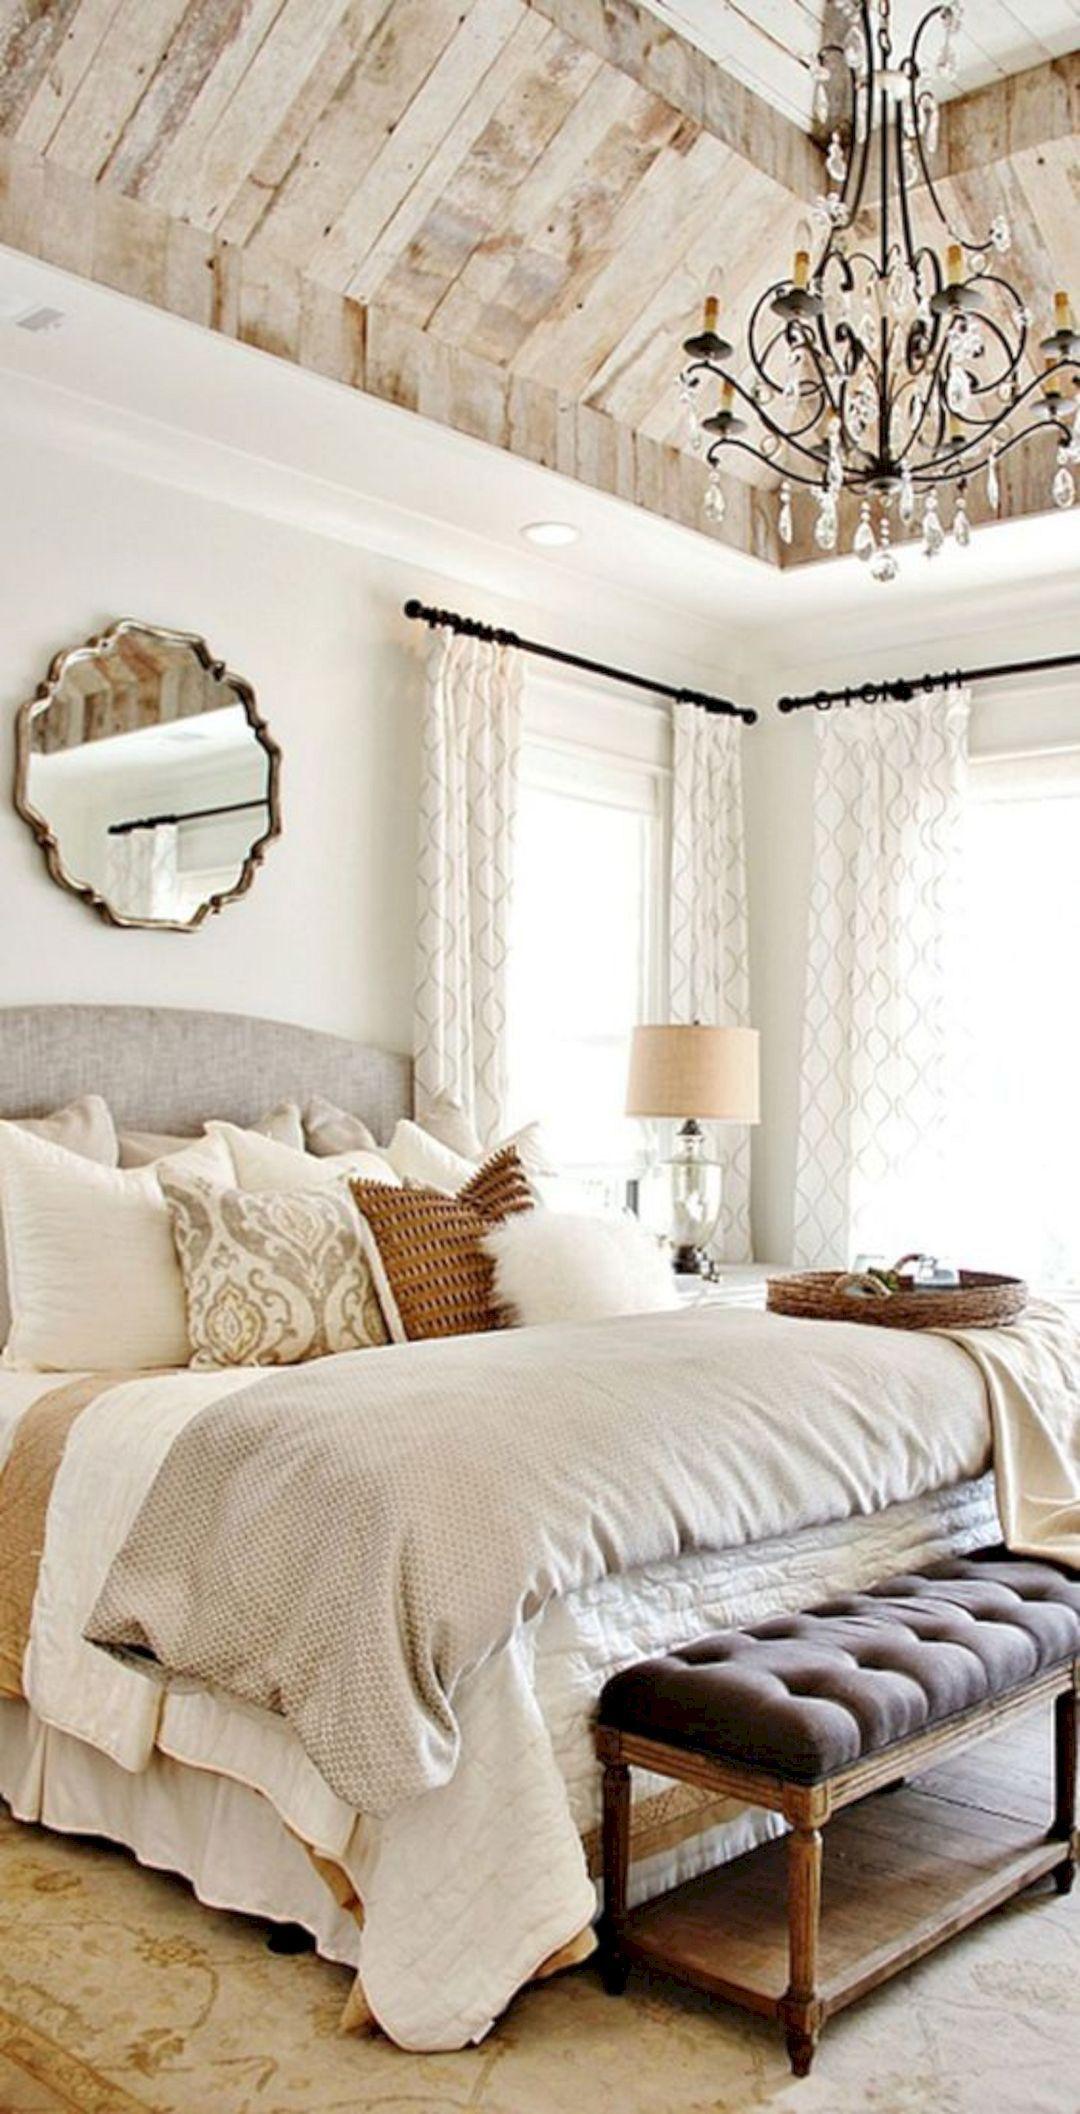 Master bedroom furniture ideas   Fantastic Master Bedroom Decorating Ideas